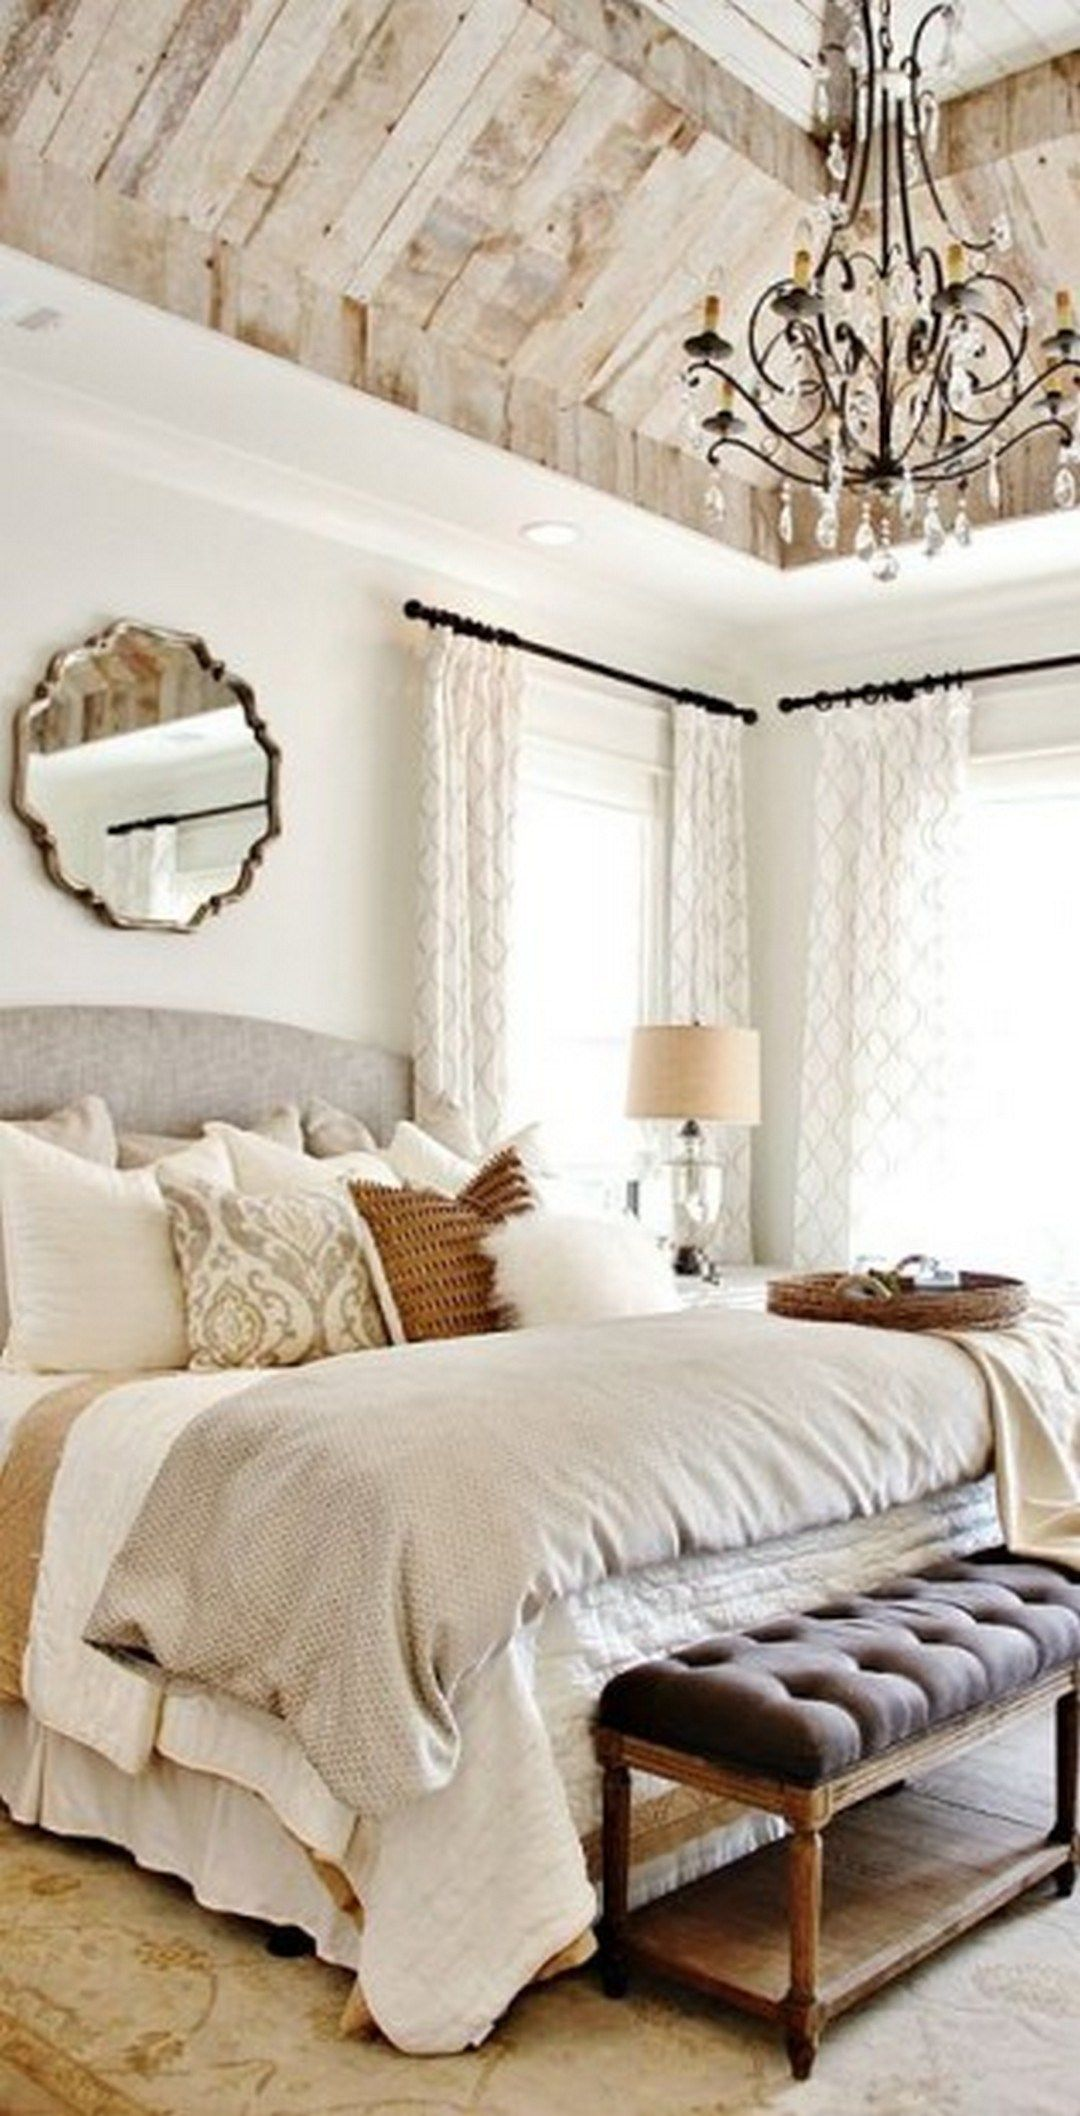 Master bedroom inspiration   Beautiful Master Bedroom Decorating Ideas   Bedroom